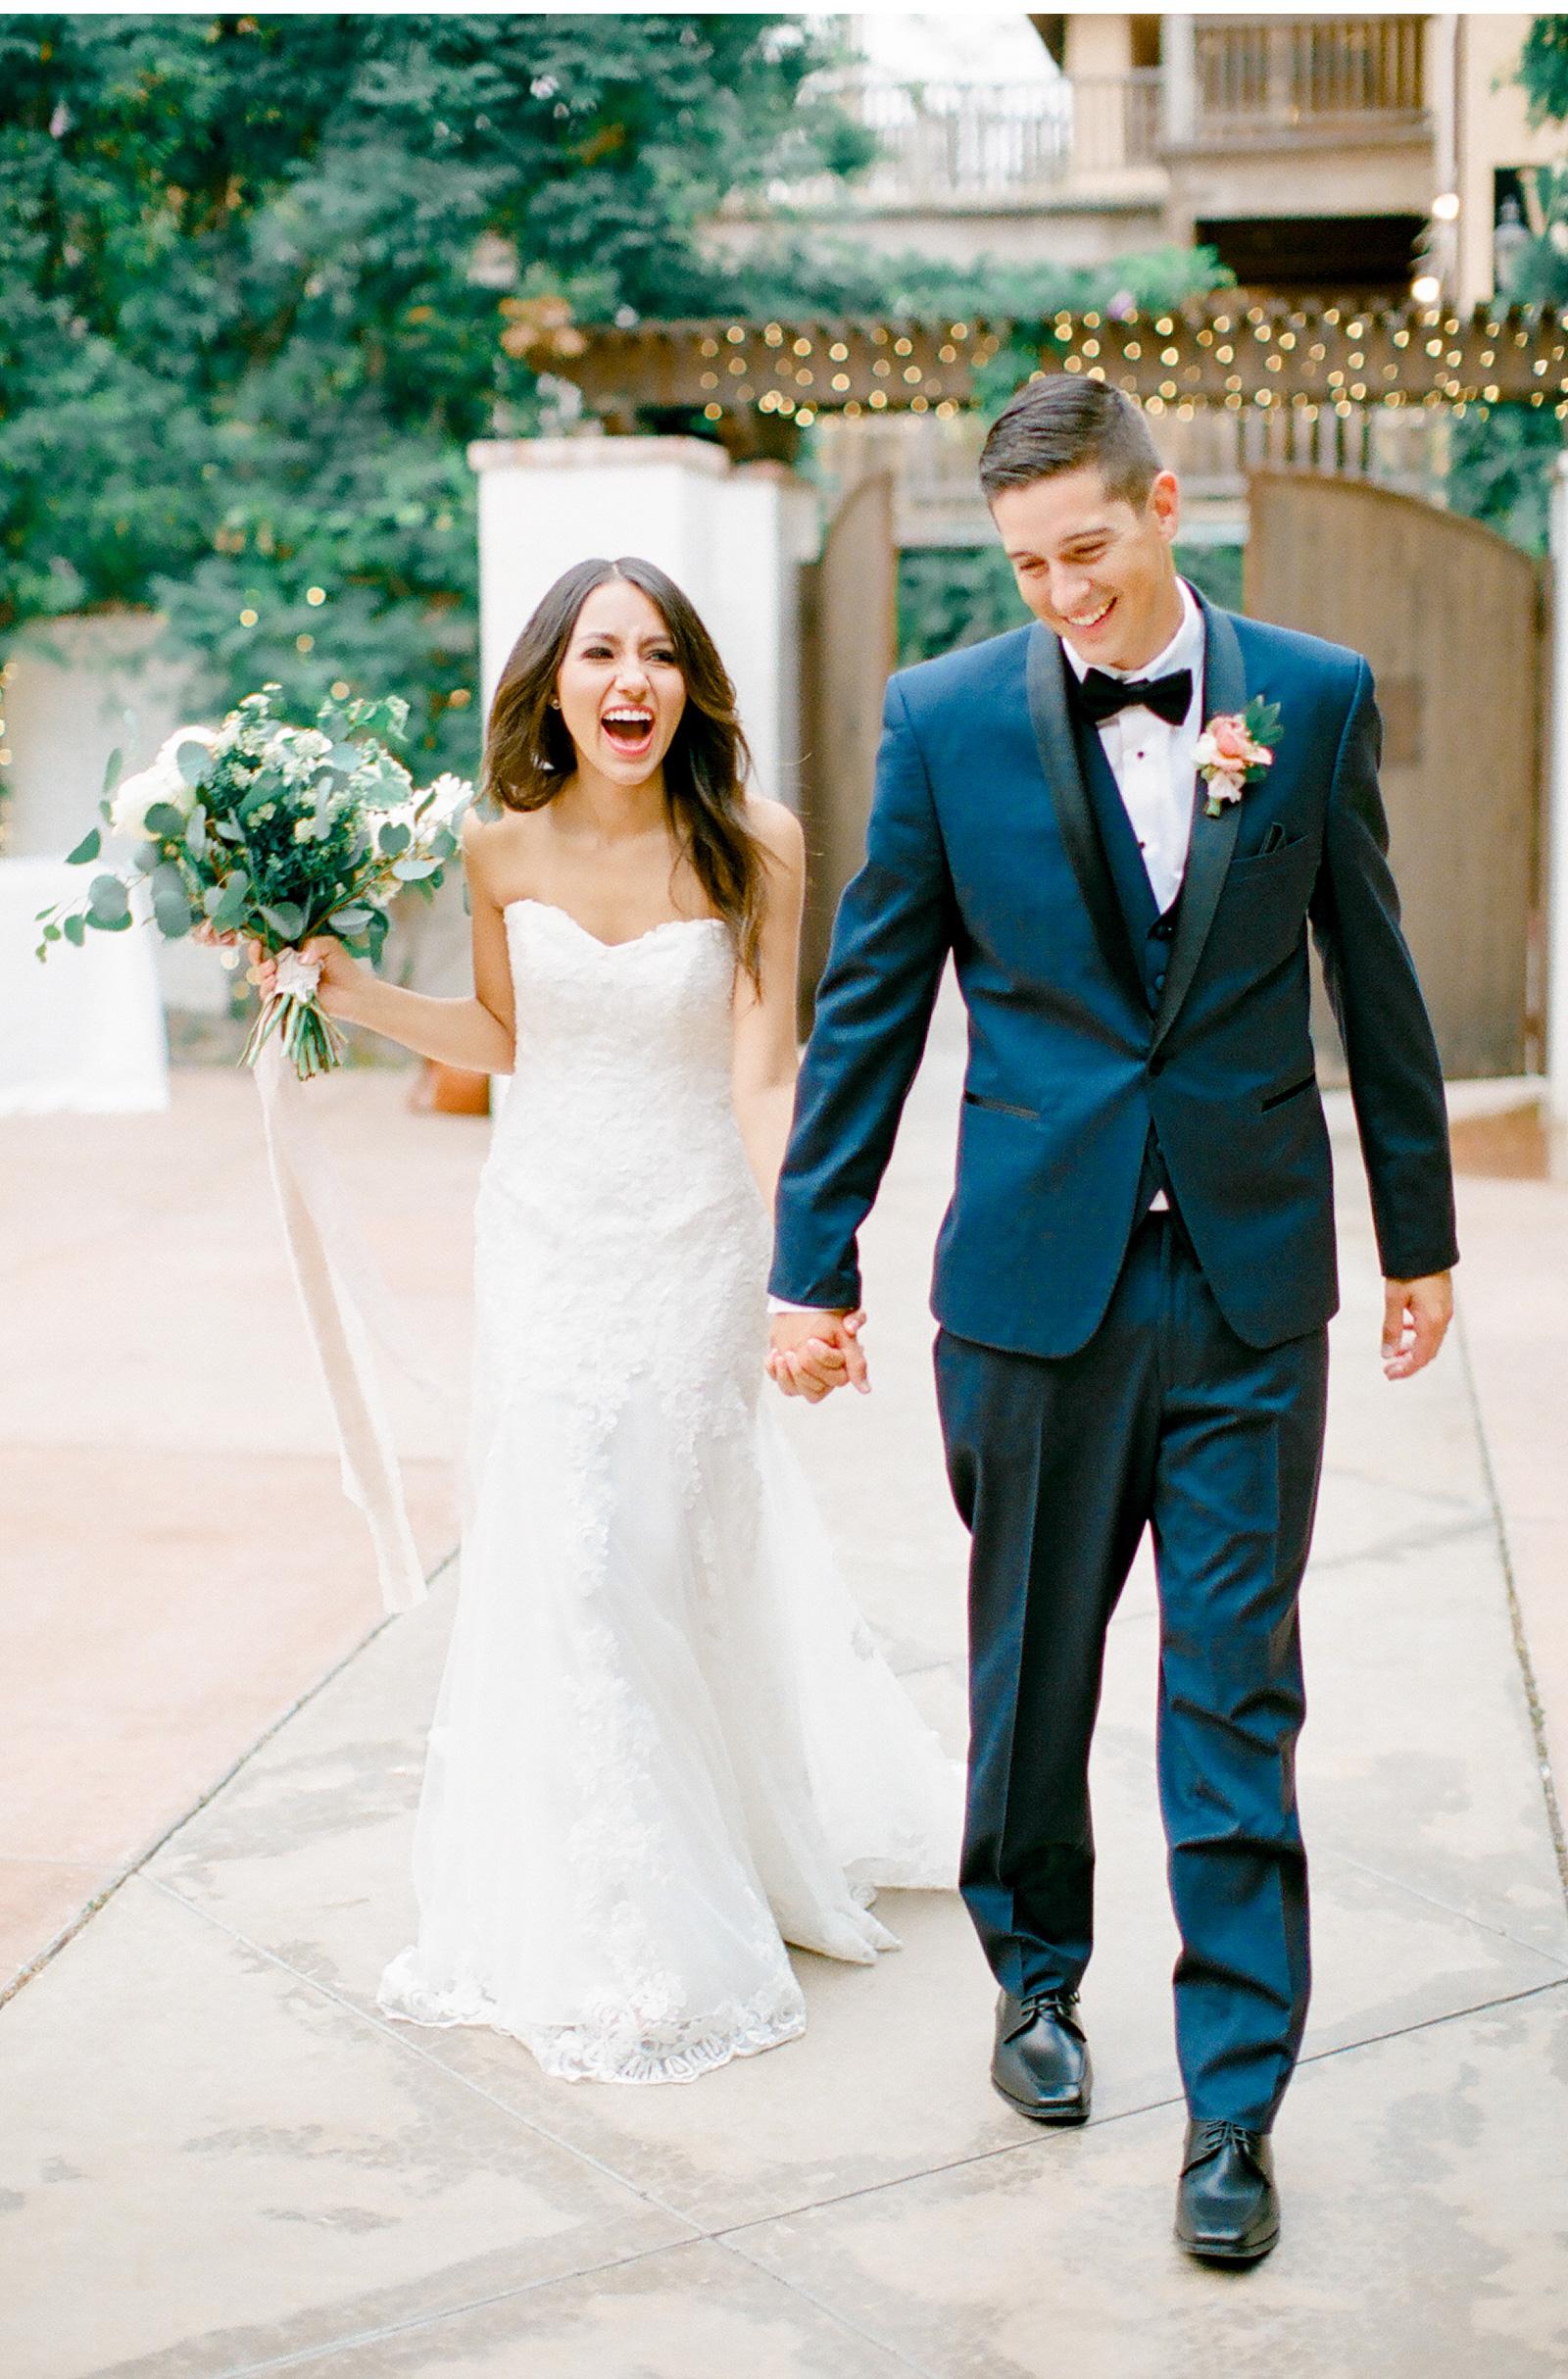 The-Villa-San-Juan-Capistrano-Wedding-Natalie-Schutt-Photography_03.jpg